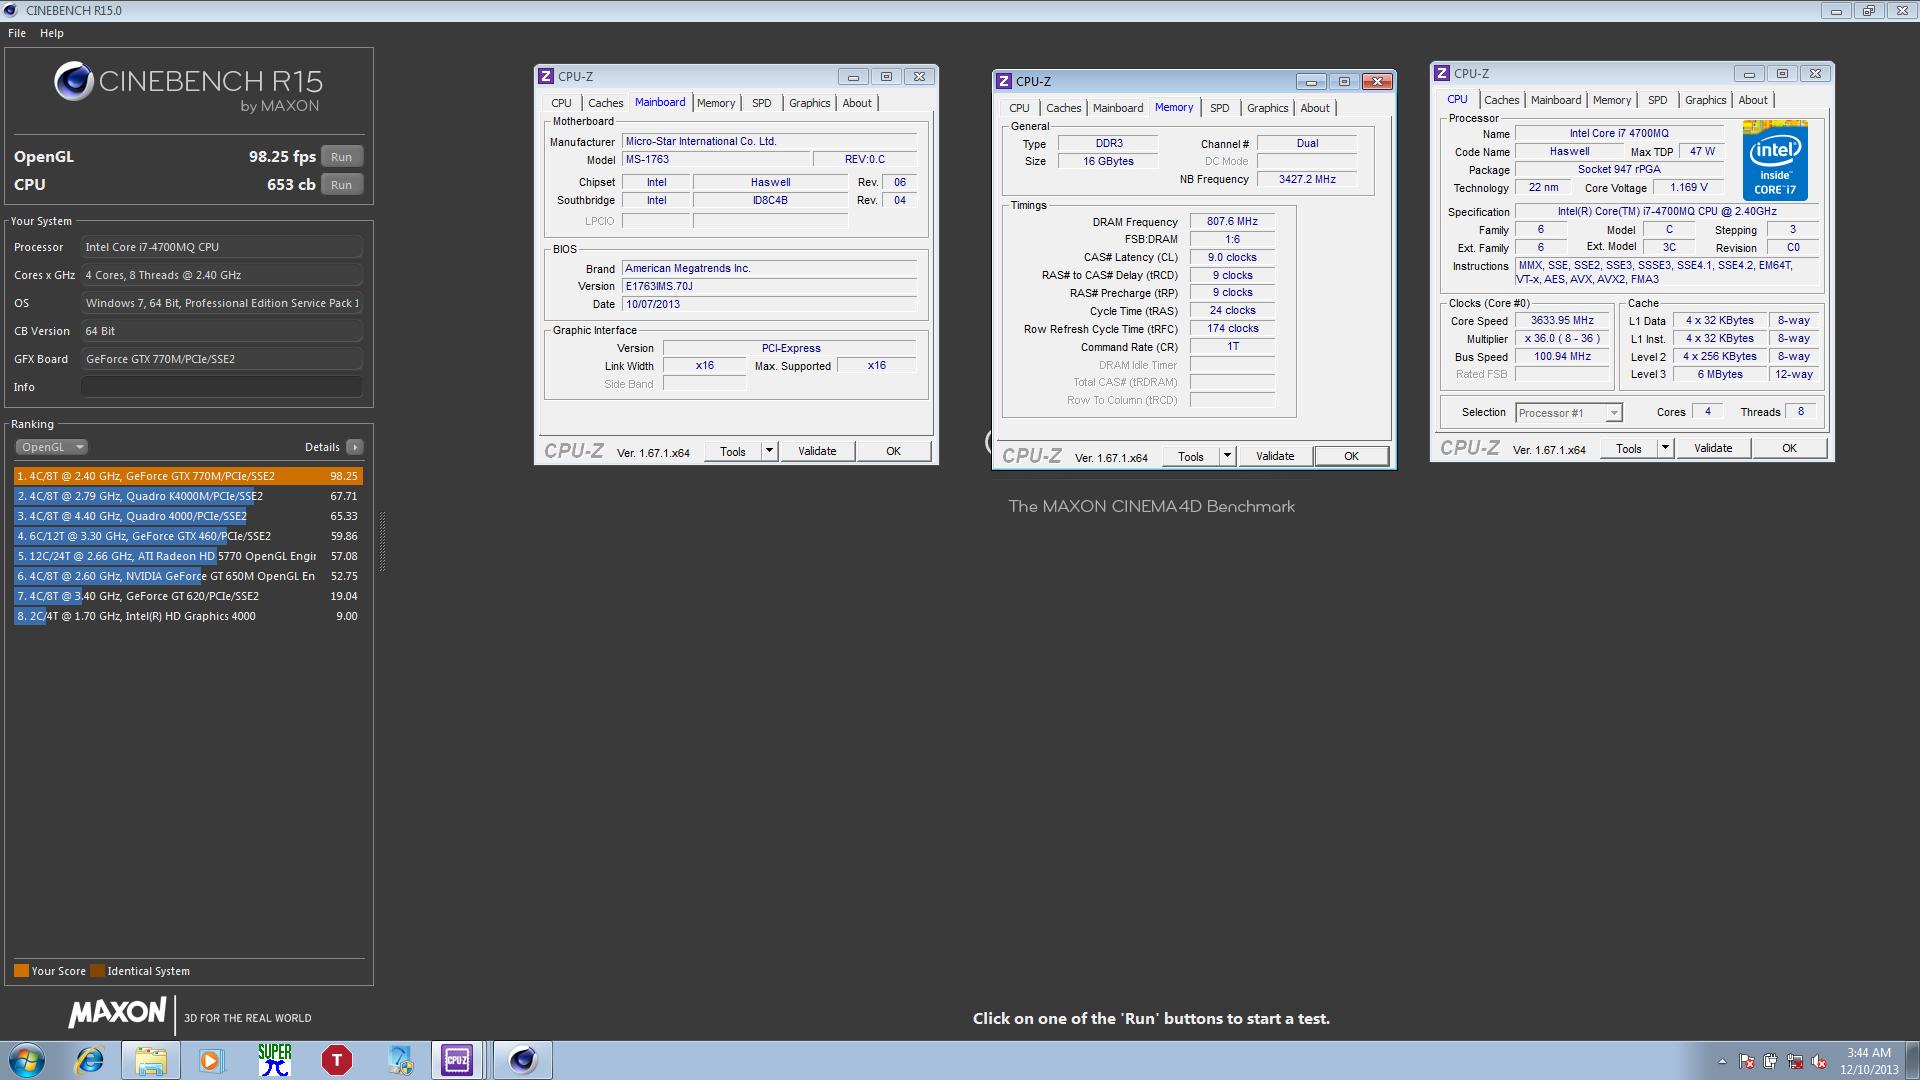 FUGGER`s Cinebench - R15 score: 653 cb with a Core i7 4700MQ